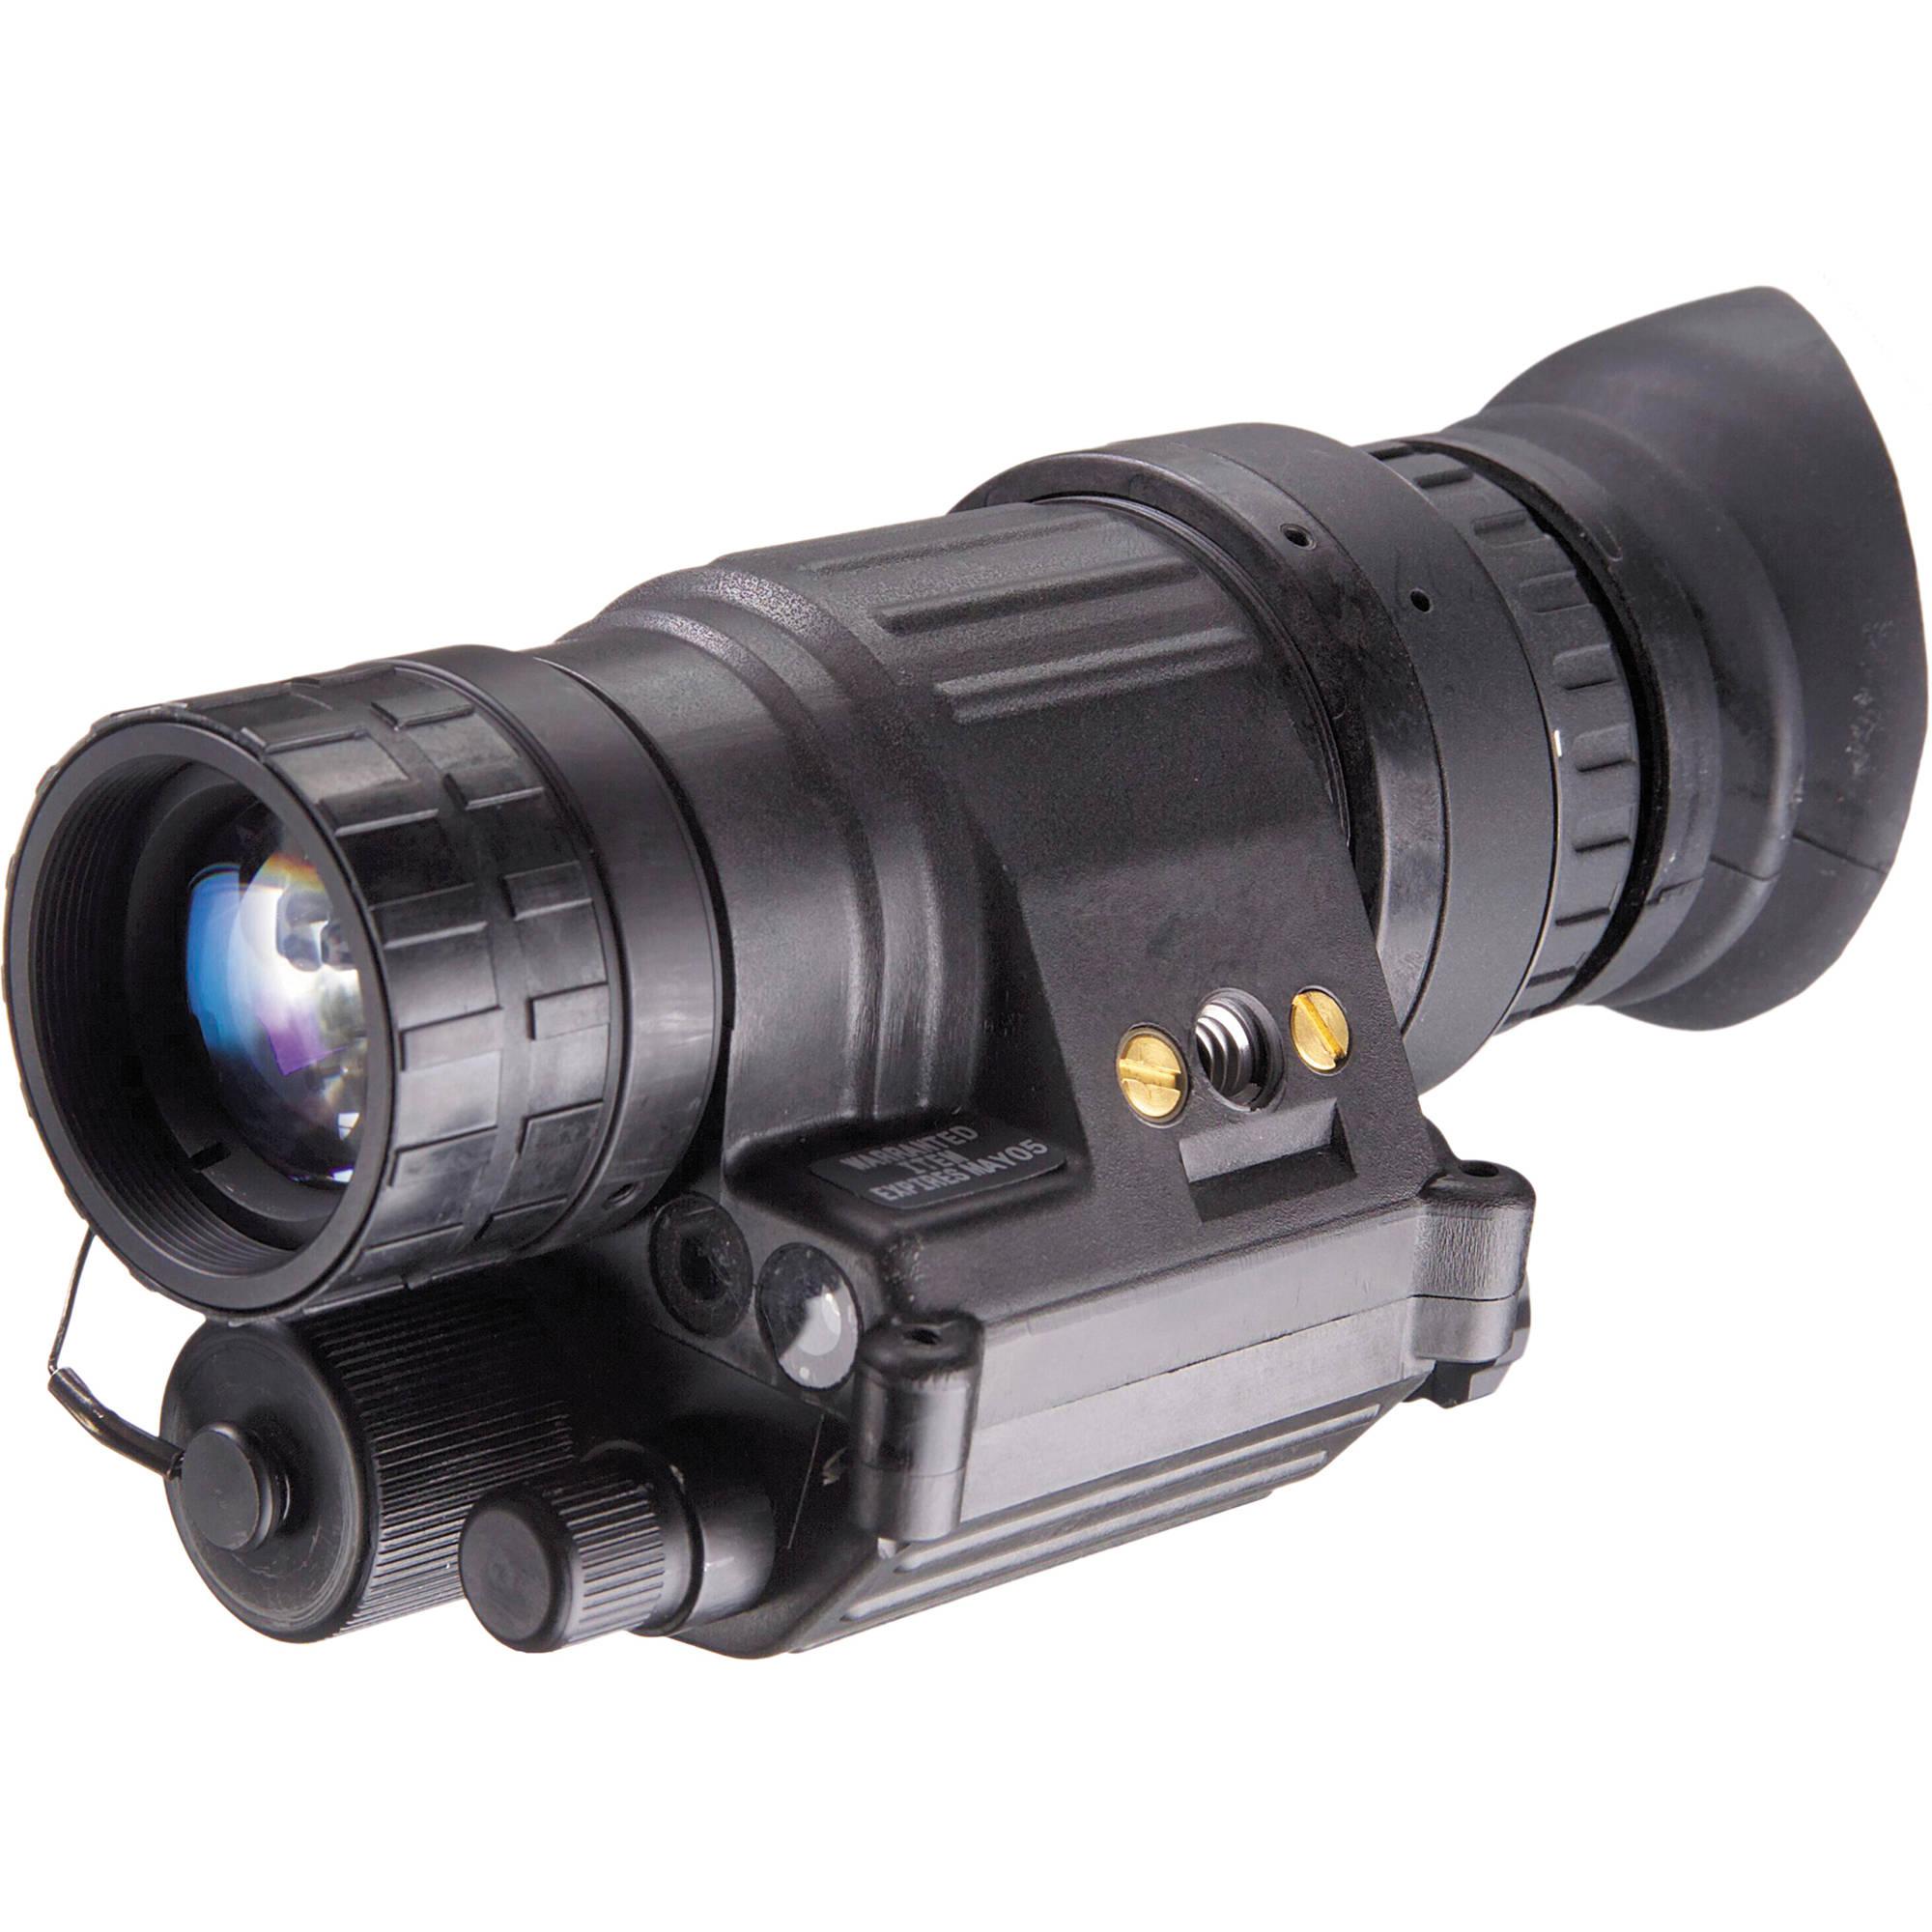 PVS-14 Blem Autogated Complete Kit - Nightlong Industries LLC